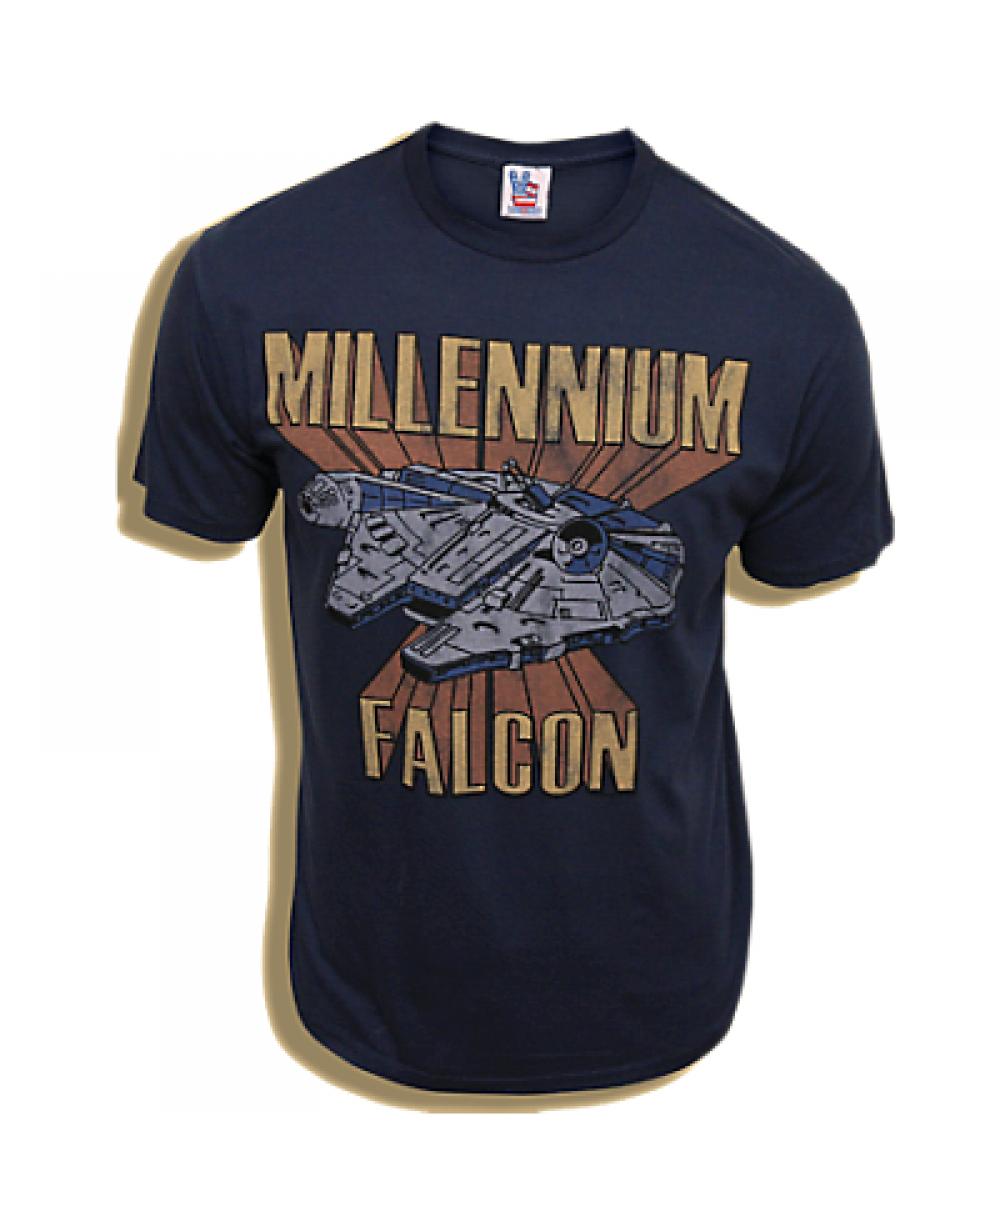 Tee falcon vintage